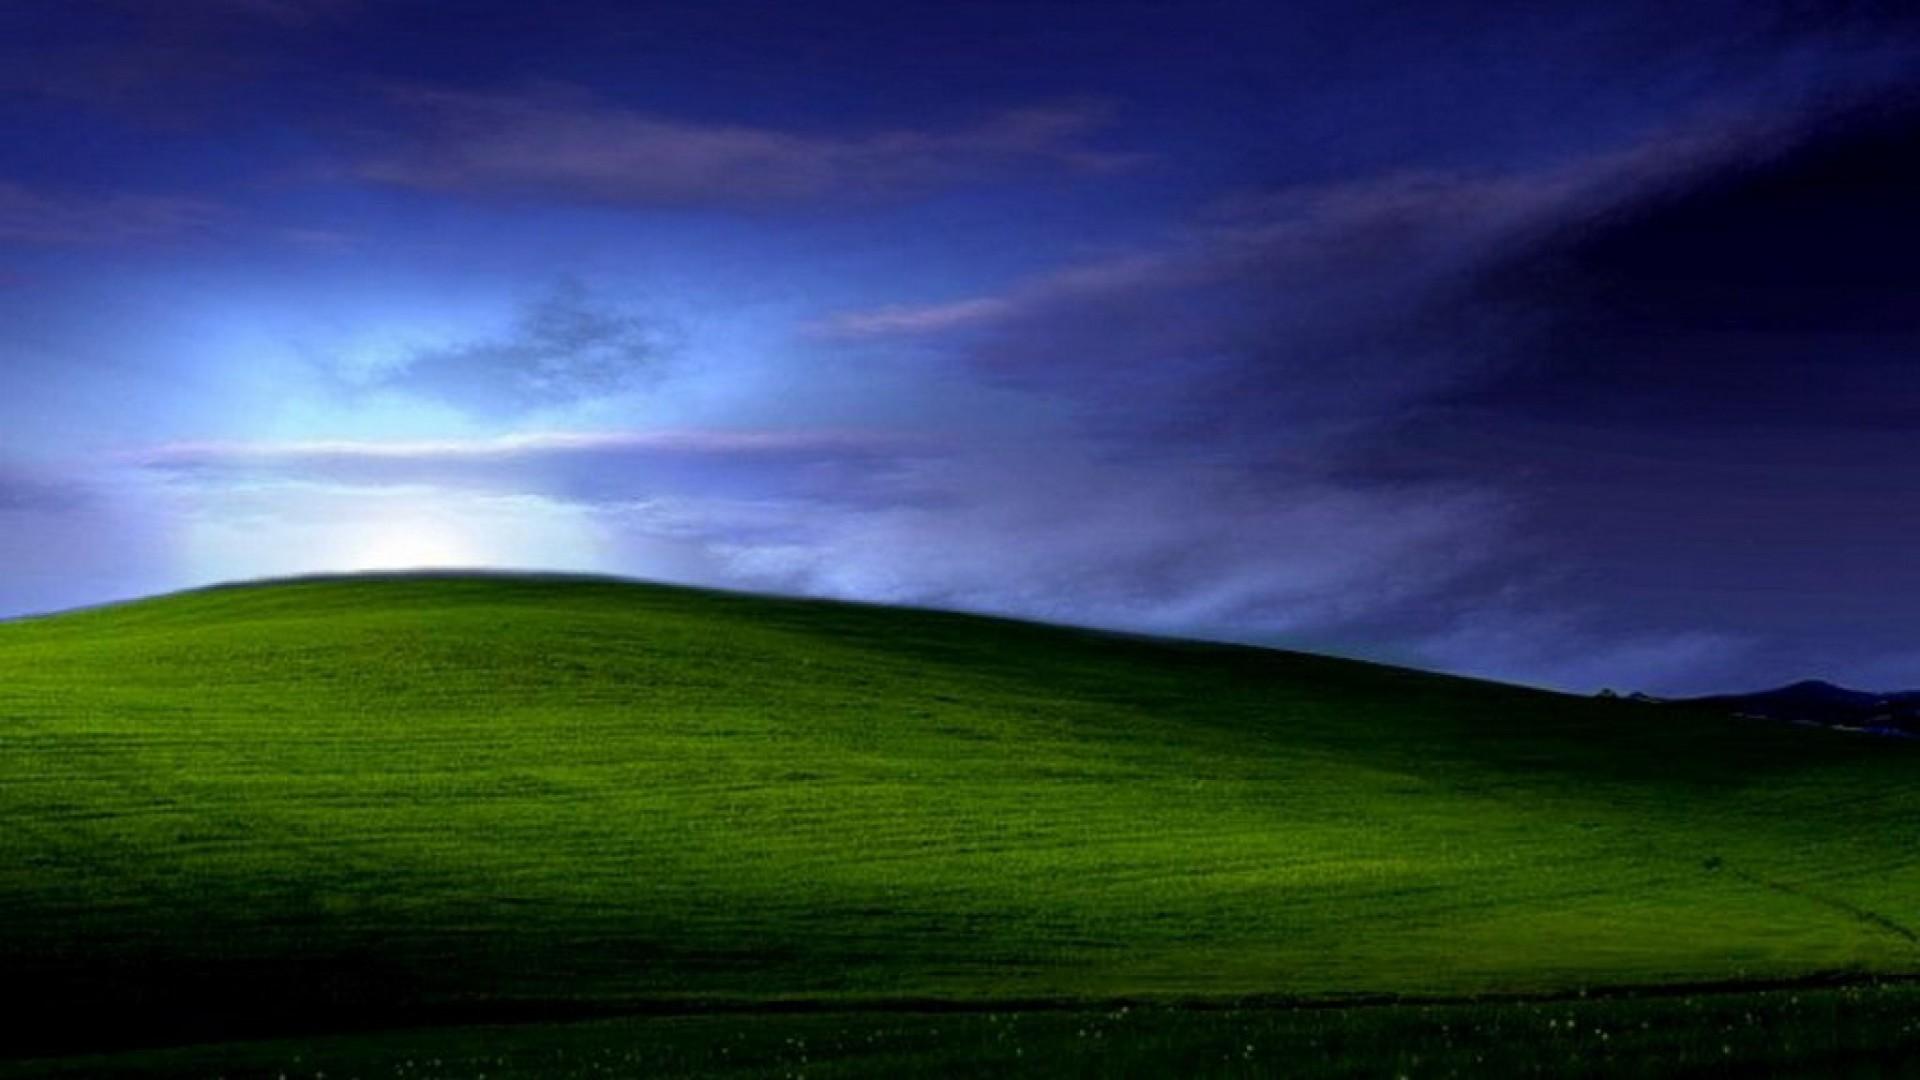 Windows xp backgrounds for Window xp wallpaper